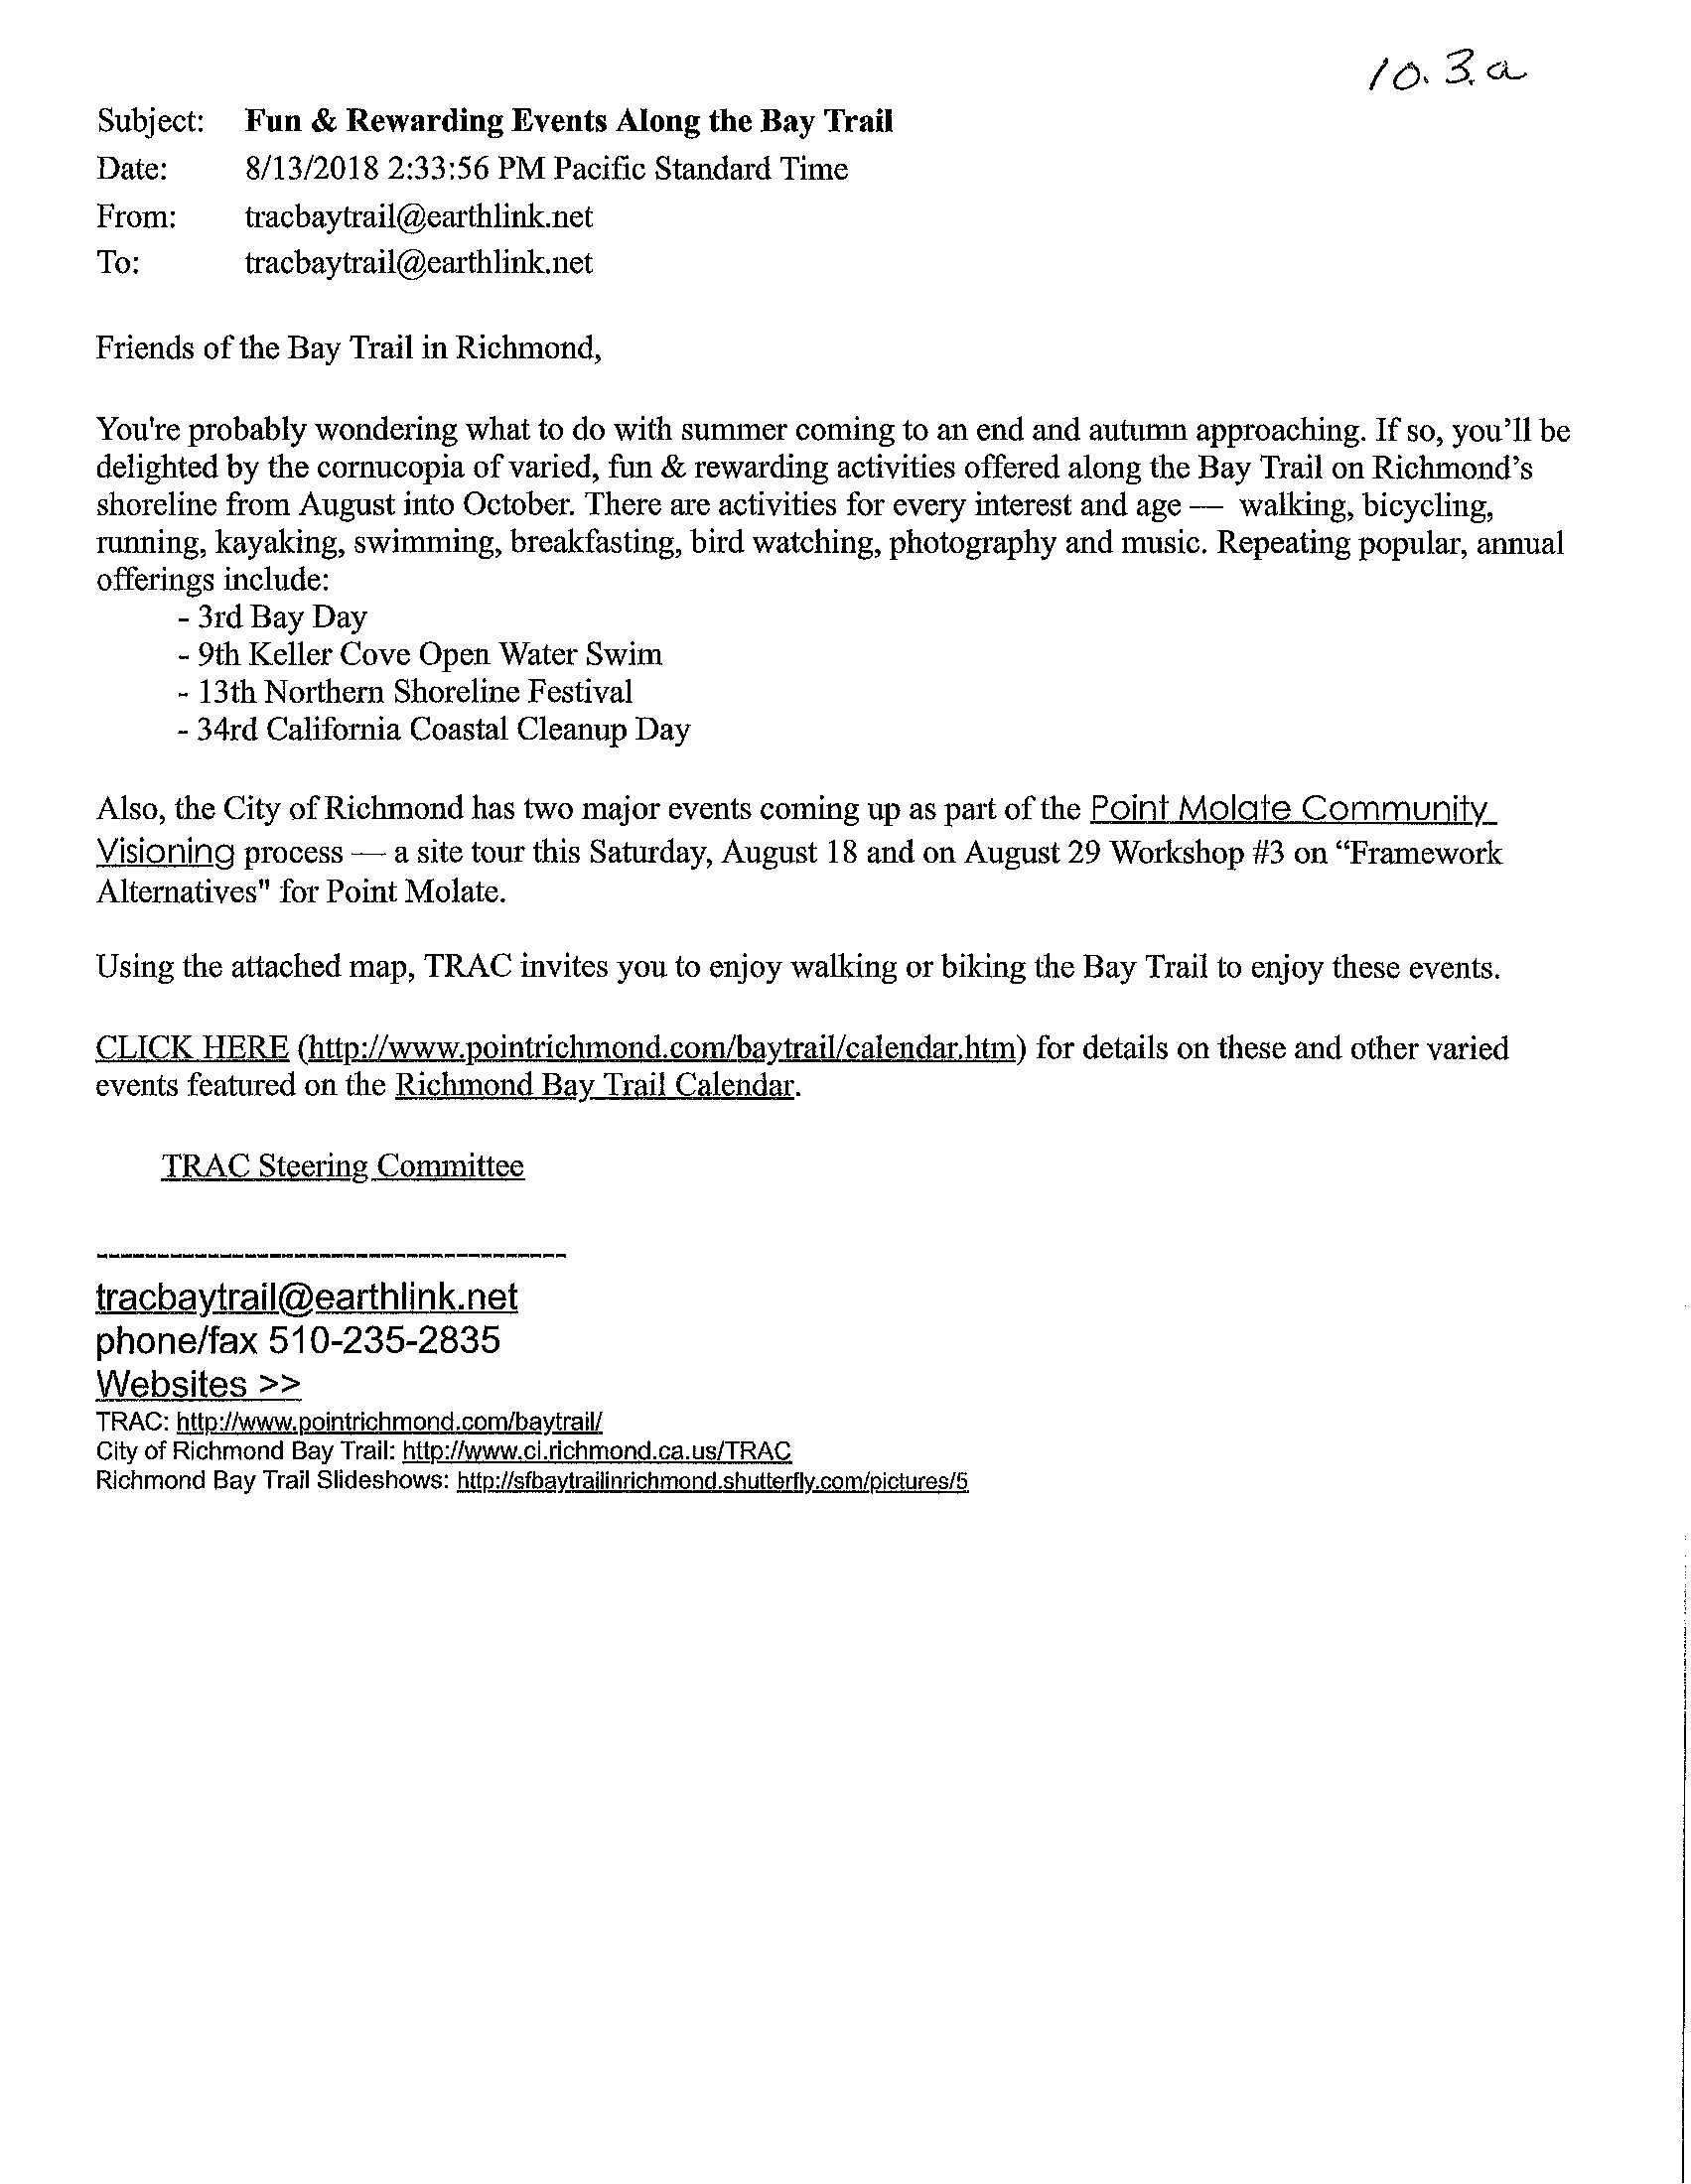 ESMAC Agenda 09.12.2018 (22 Pages)_13.jpg